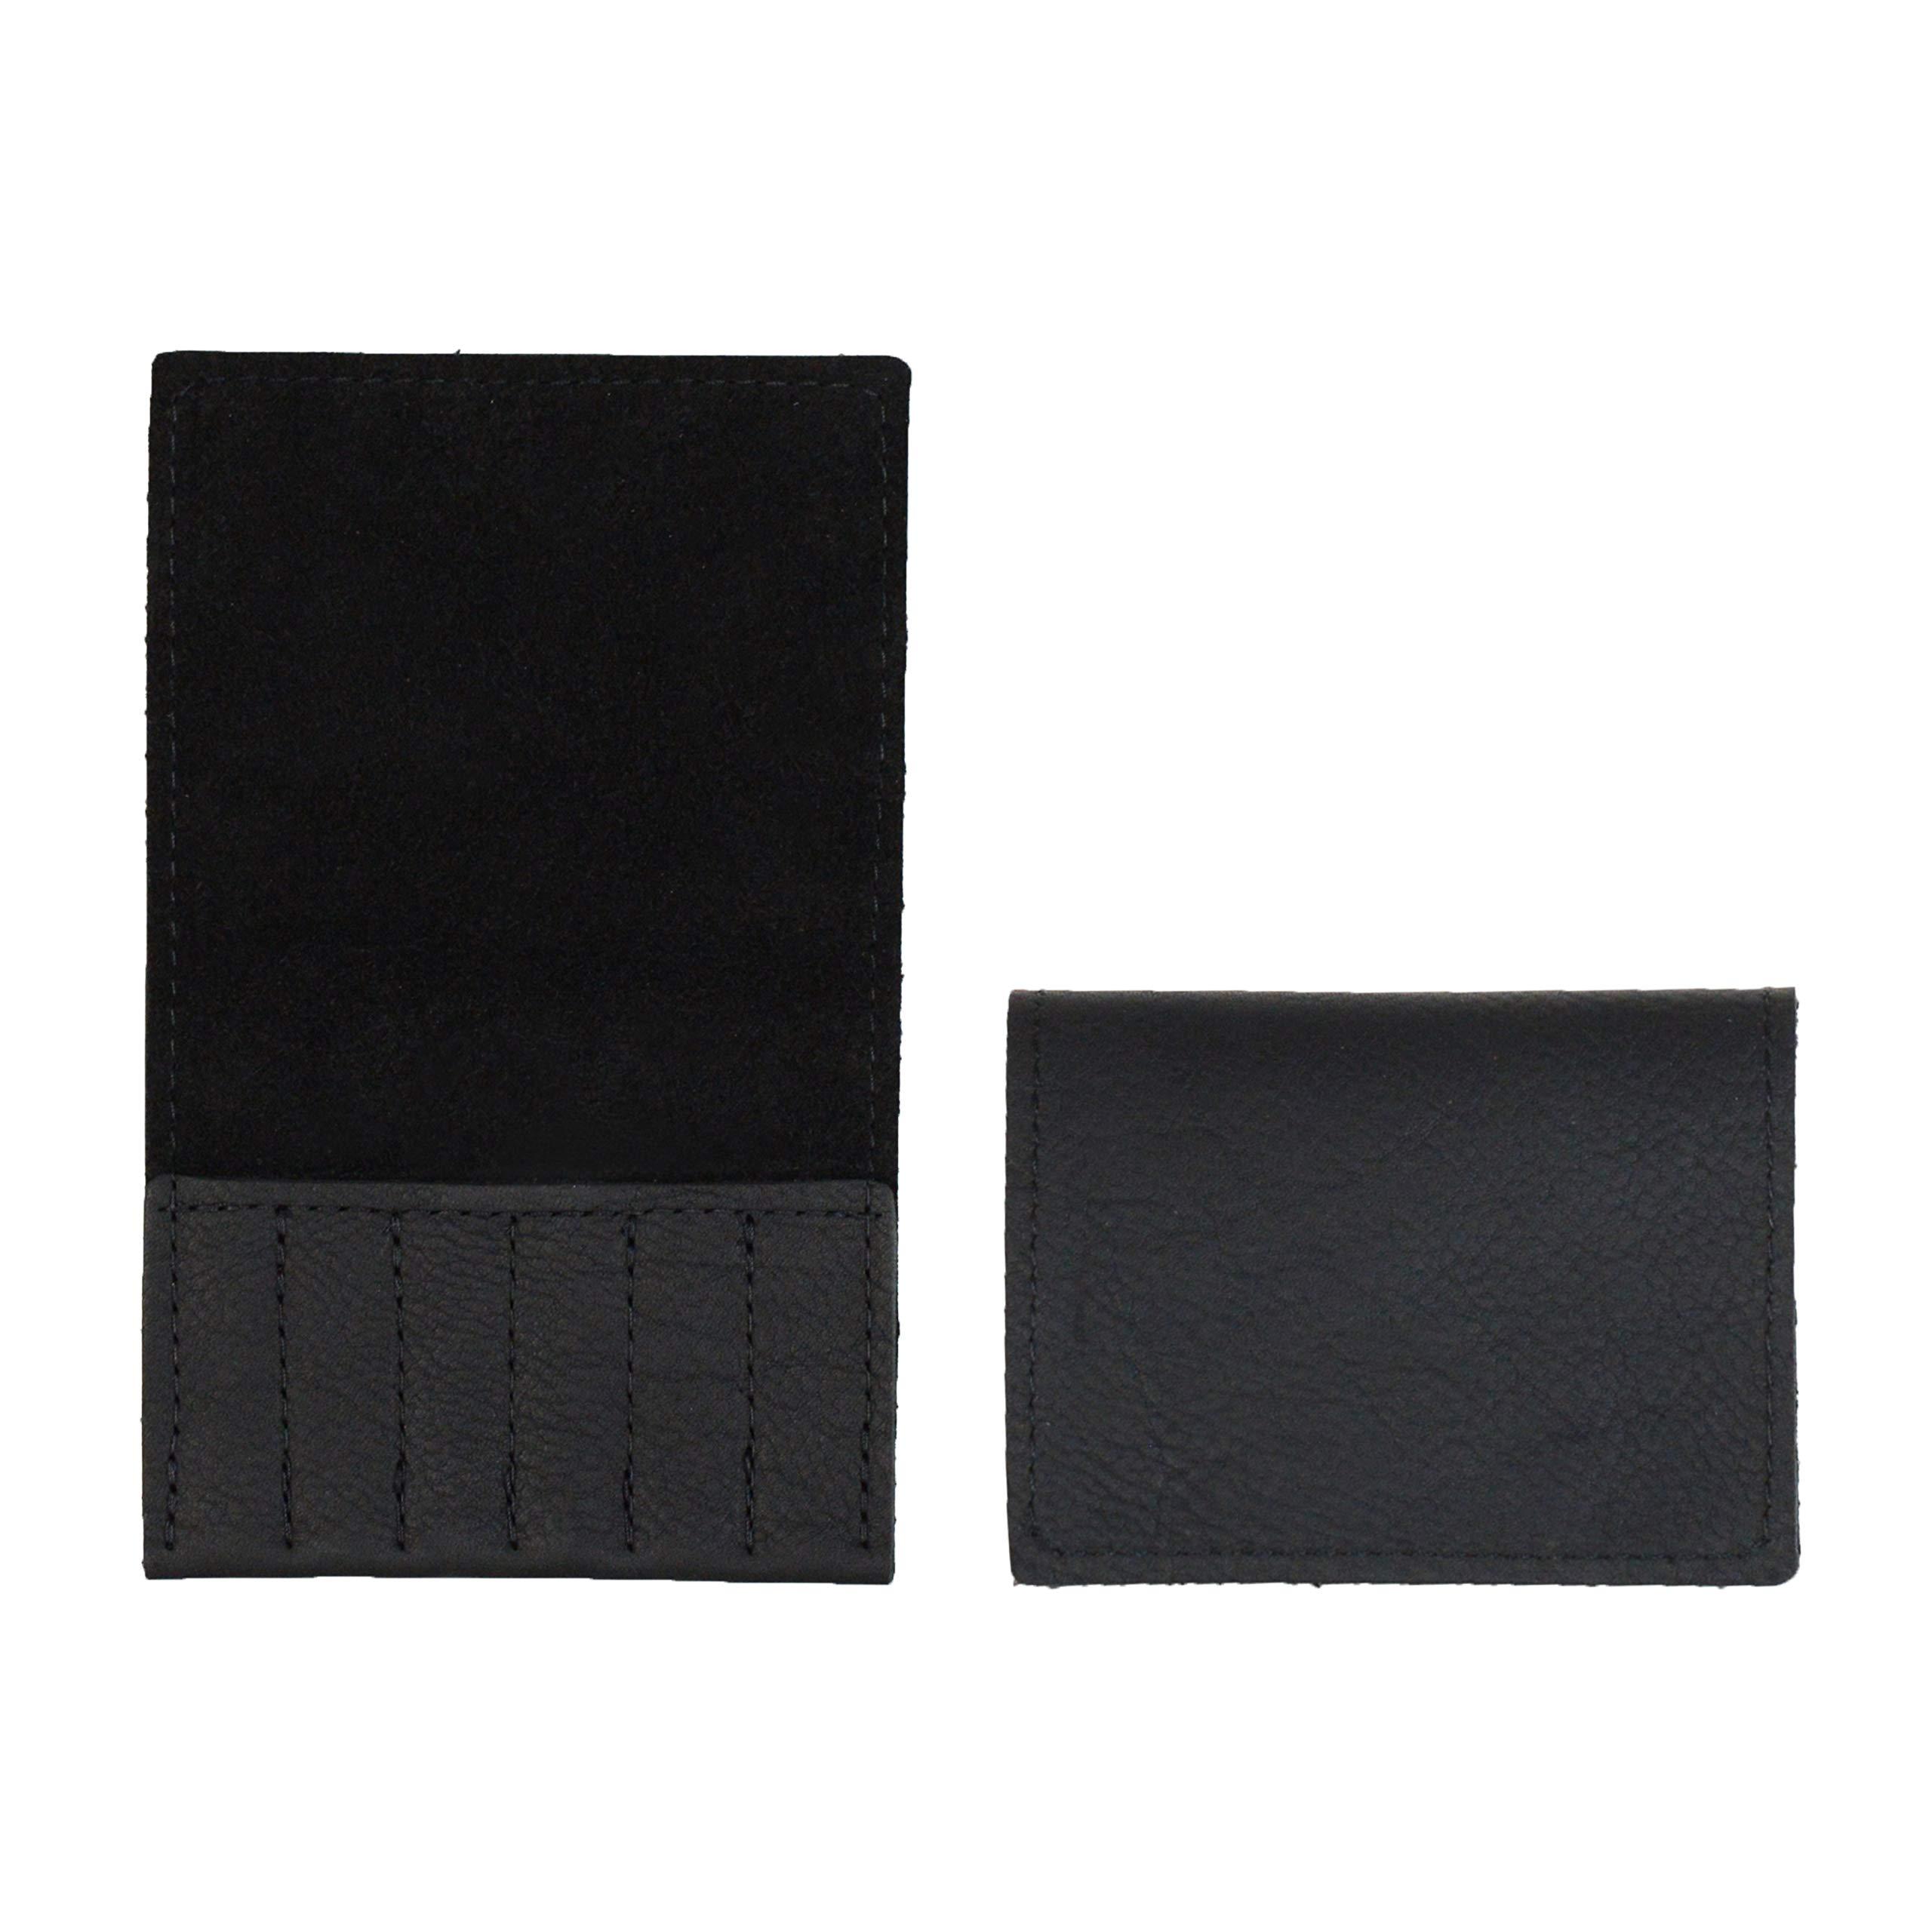 Handmade Leather Collar Stay Holder Gift for Him Collar Stay Case- Groomsmen Gift (Arizona Black Collar Stay Case)